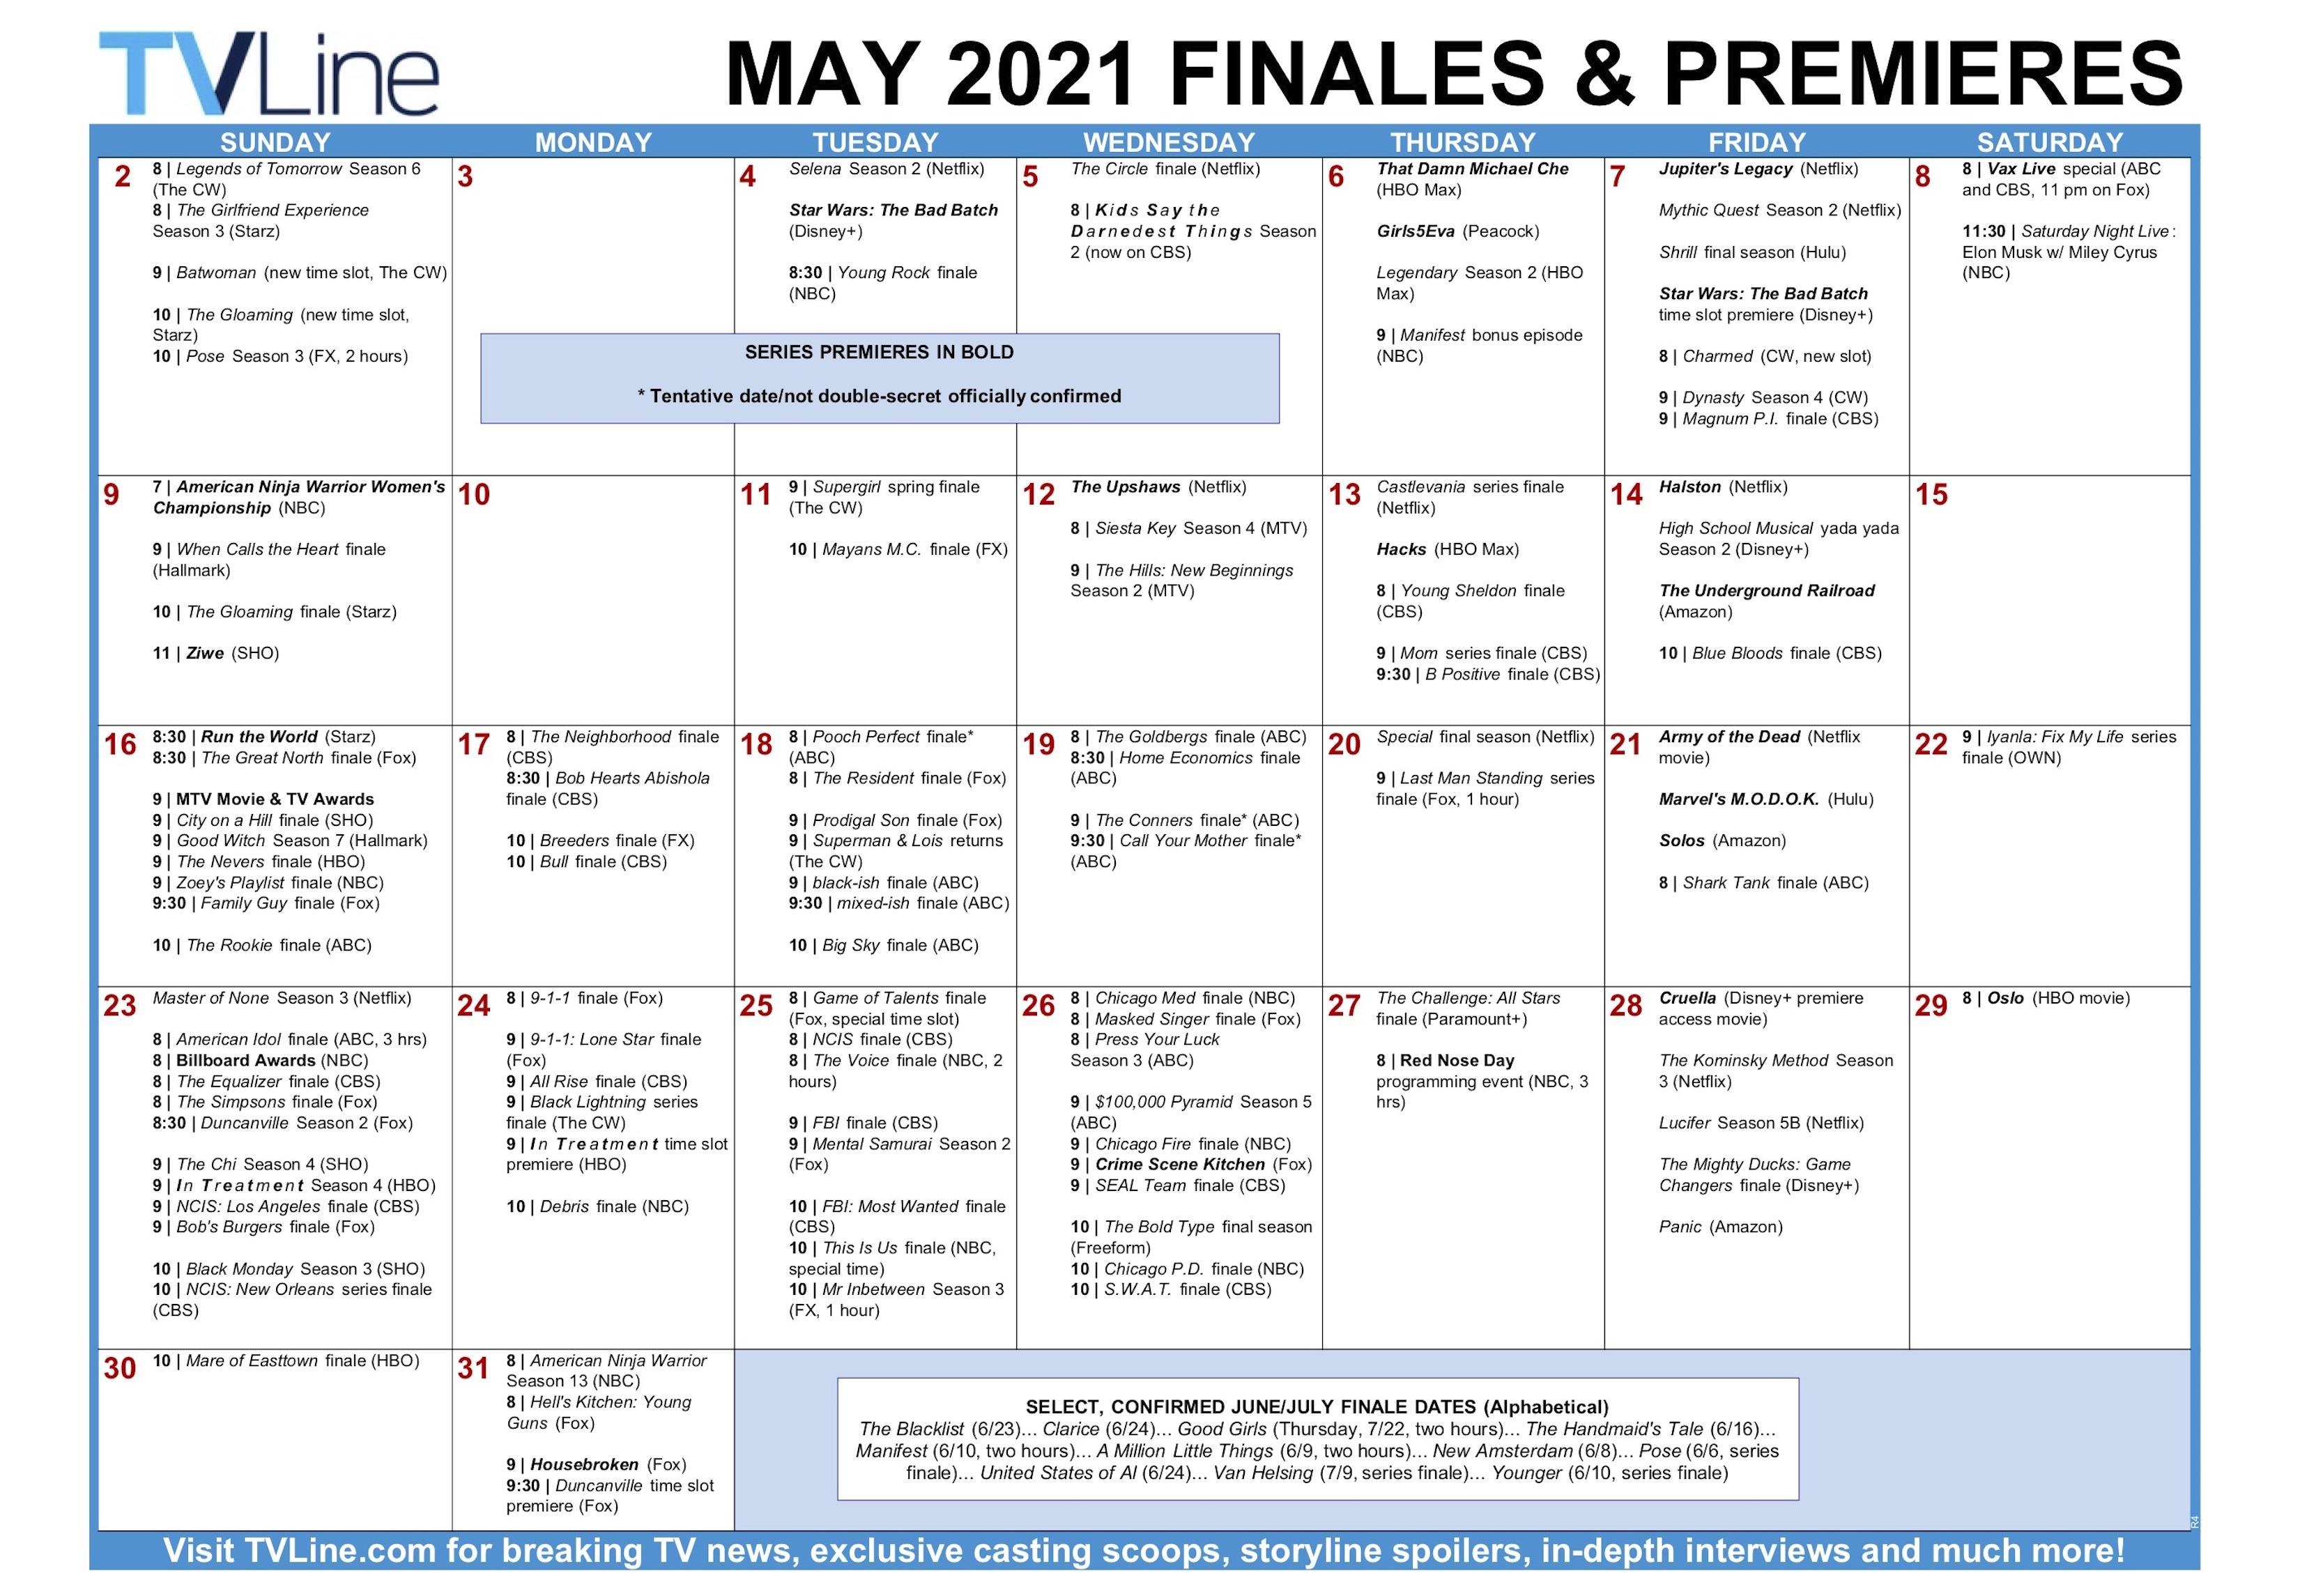 TV-schedule-may-finales-2021-calendar-r1